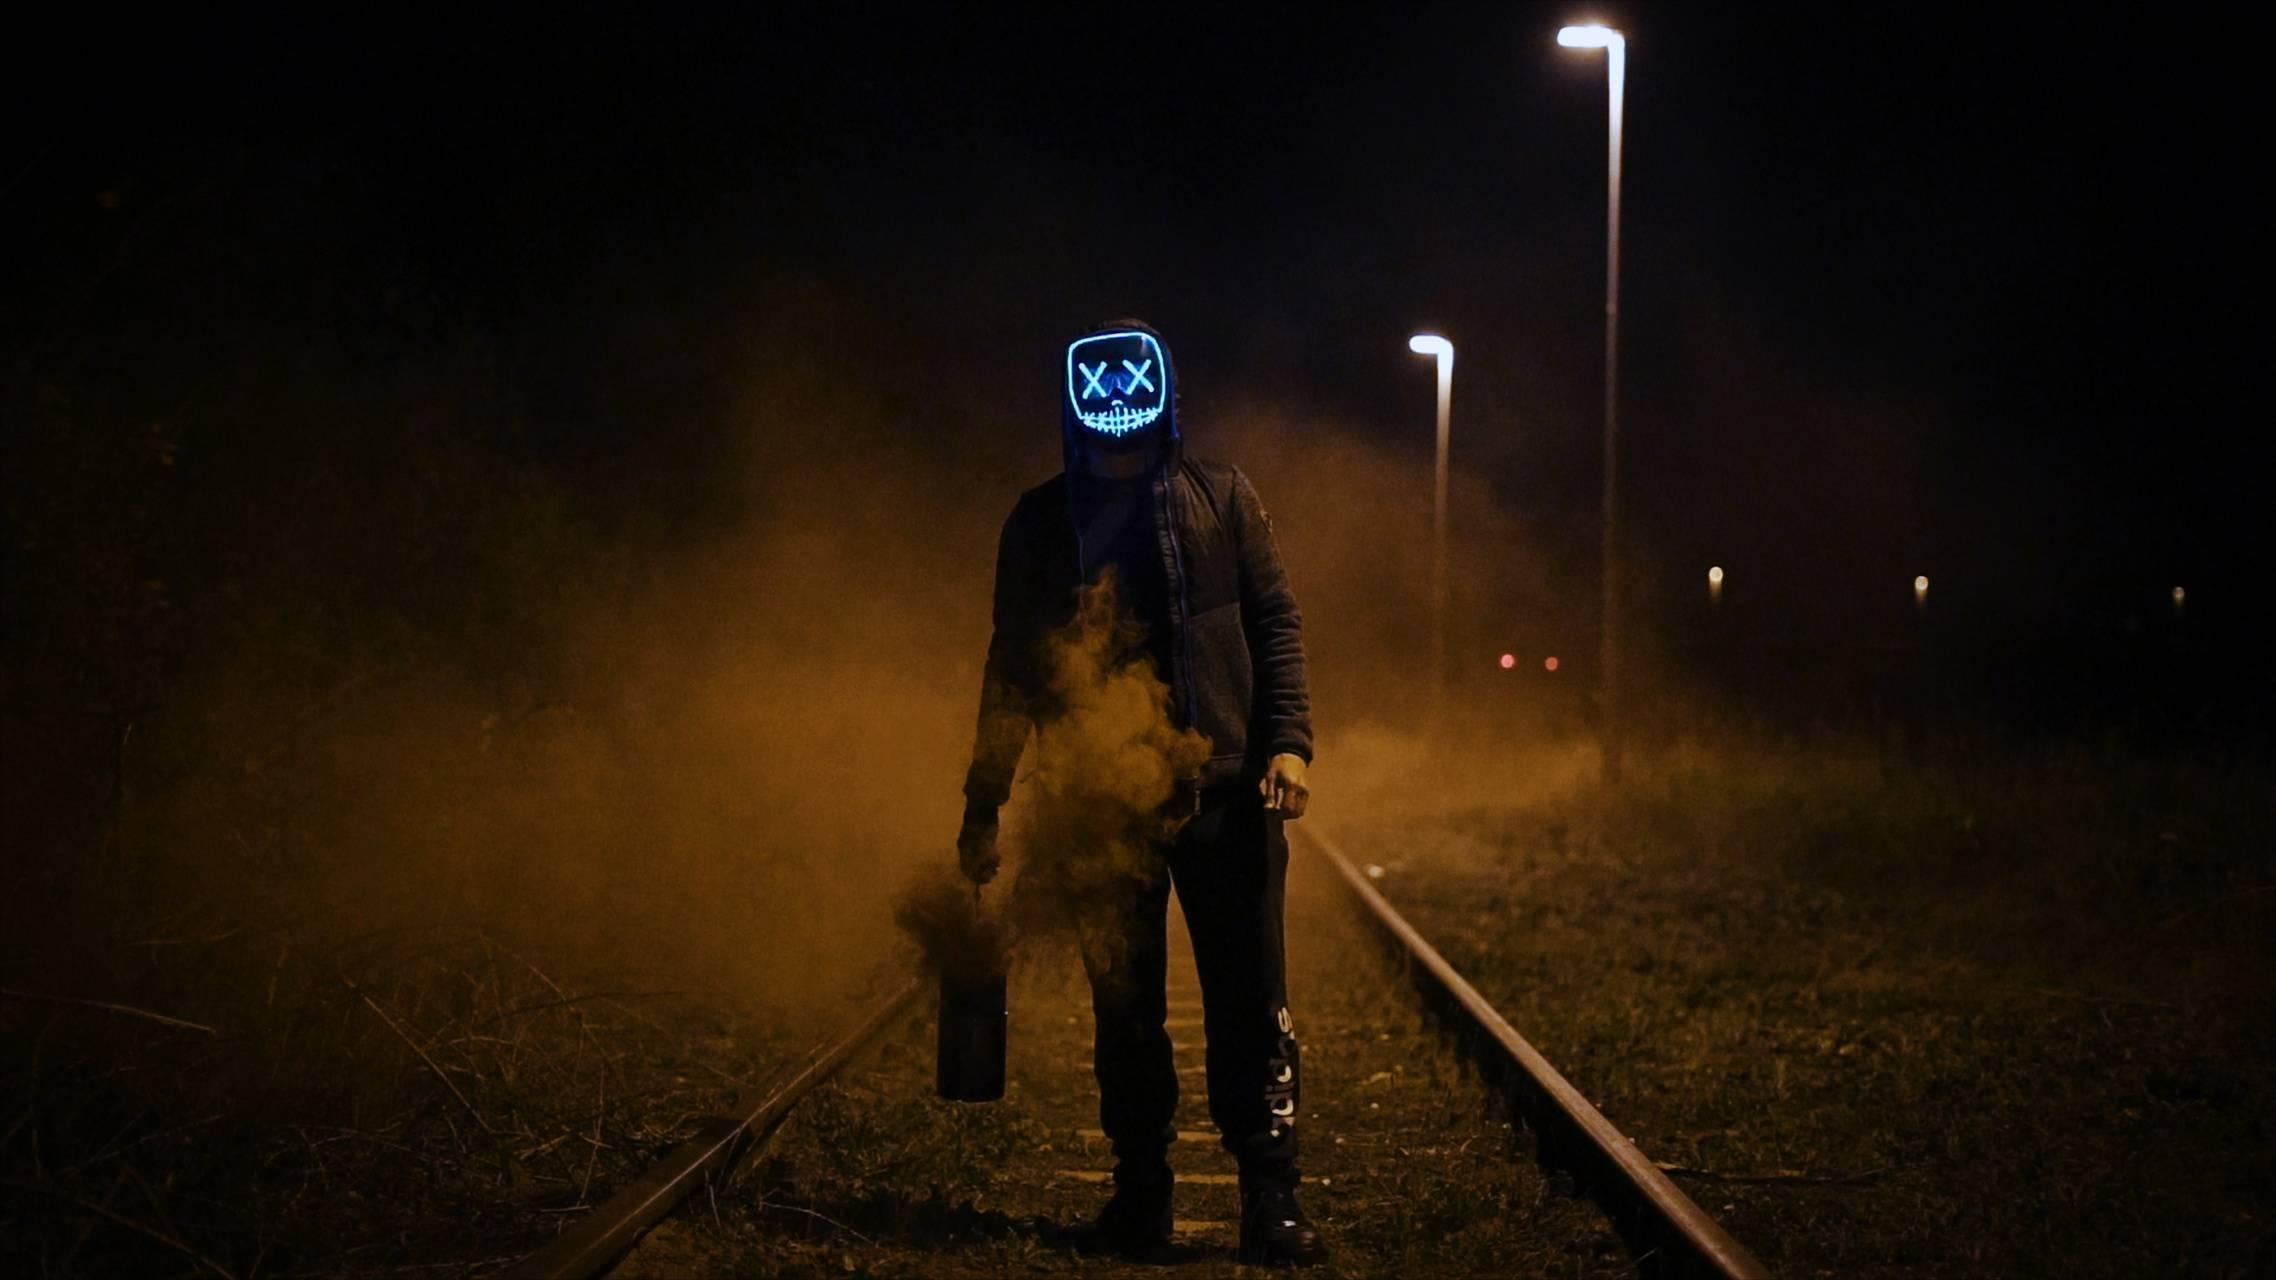 Scary masked man